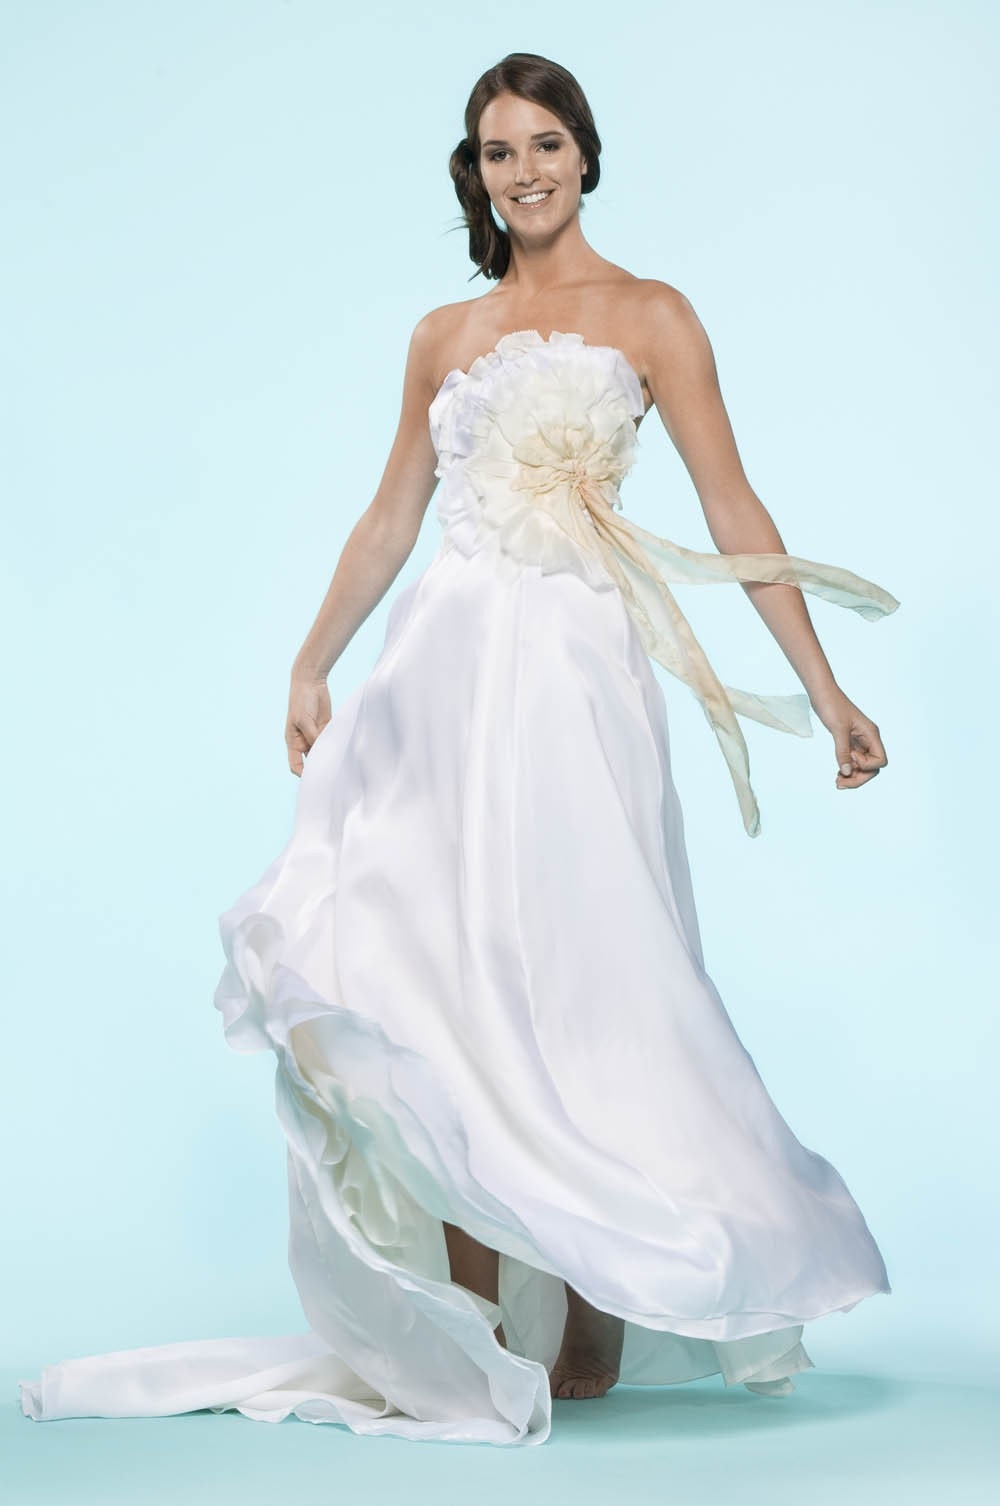 Anson Street Dress, $2,485.00